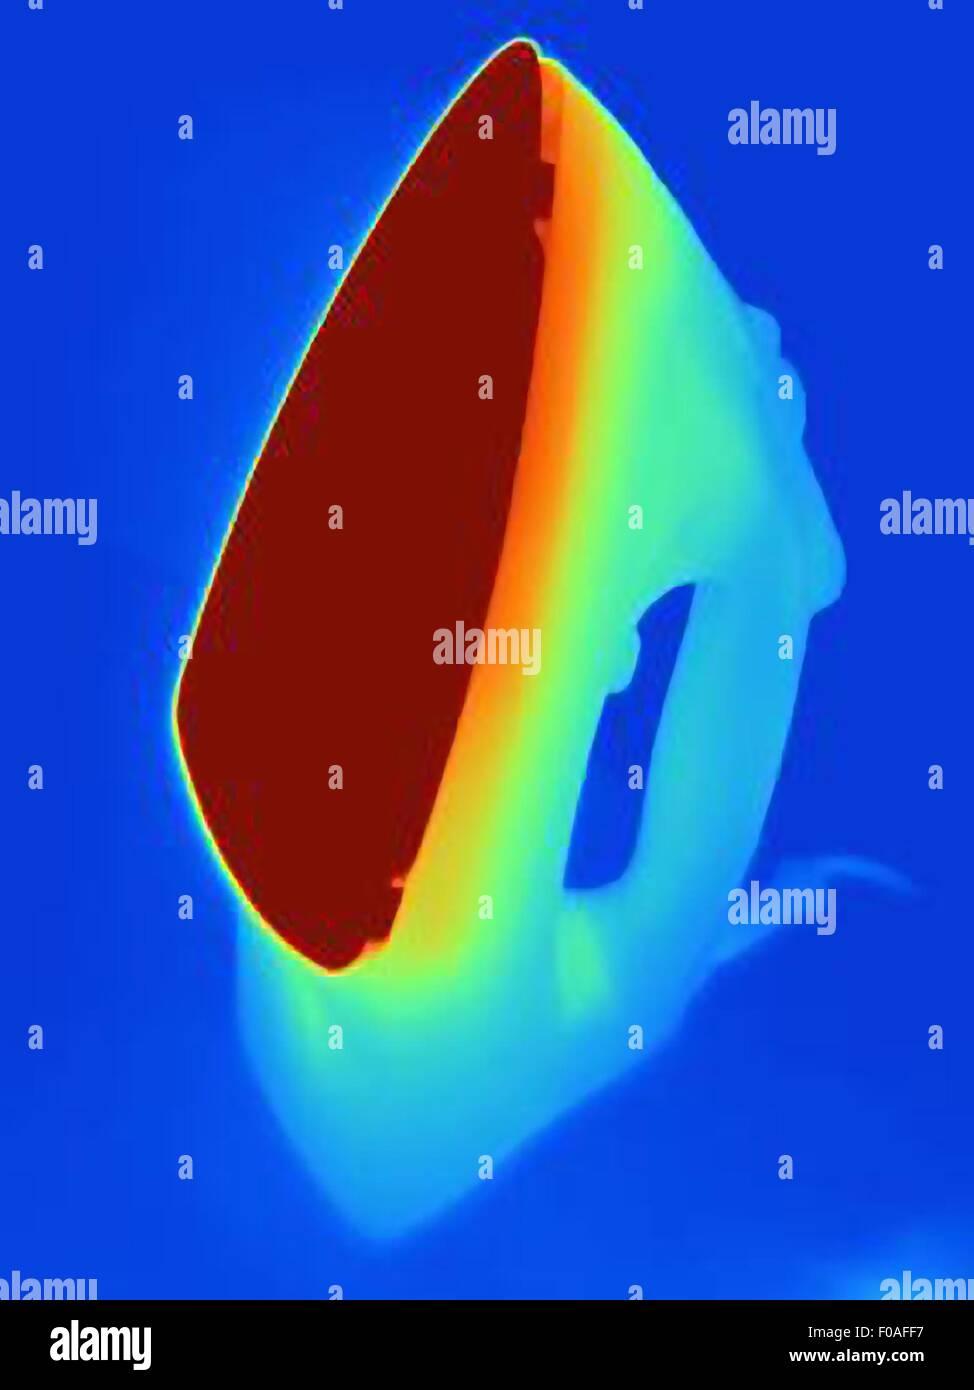 Immagine termica di un ferro da stiro Immagini Stock